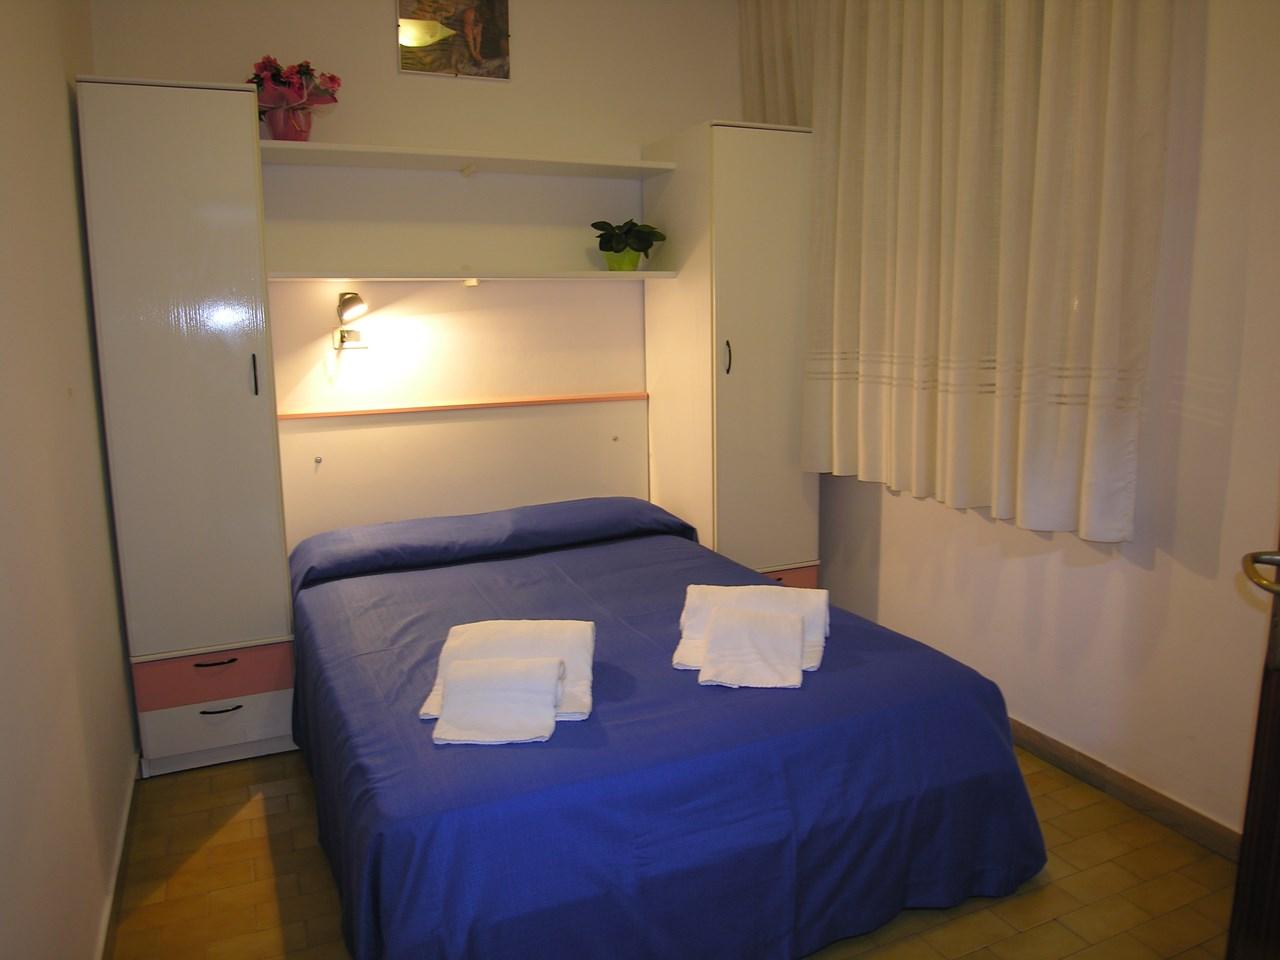 doppelzimmer ohne balkon hotel tahiti garni b b. Black Bedroom Furniture Sets. Home Design Ideas